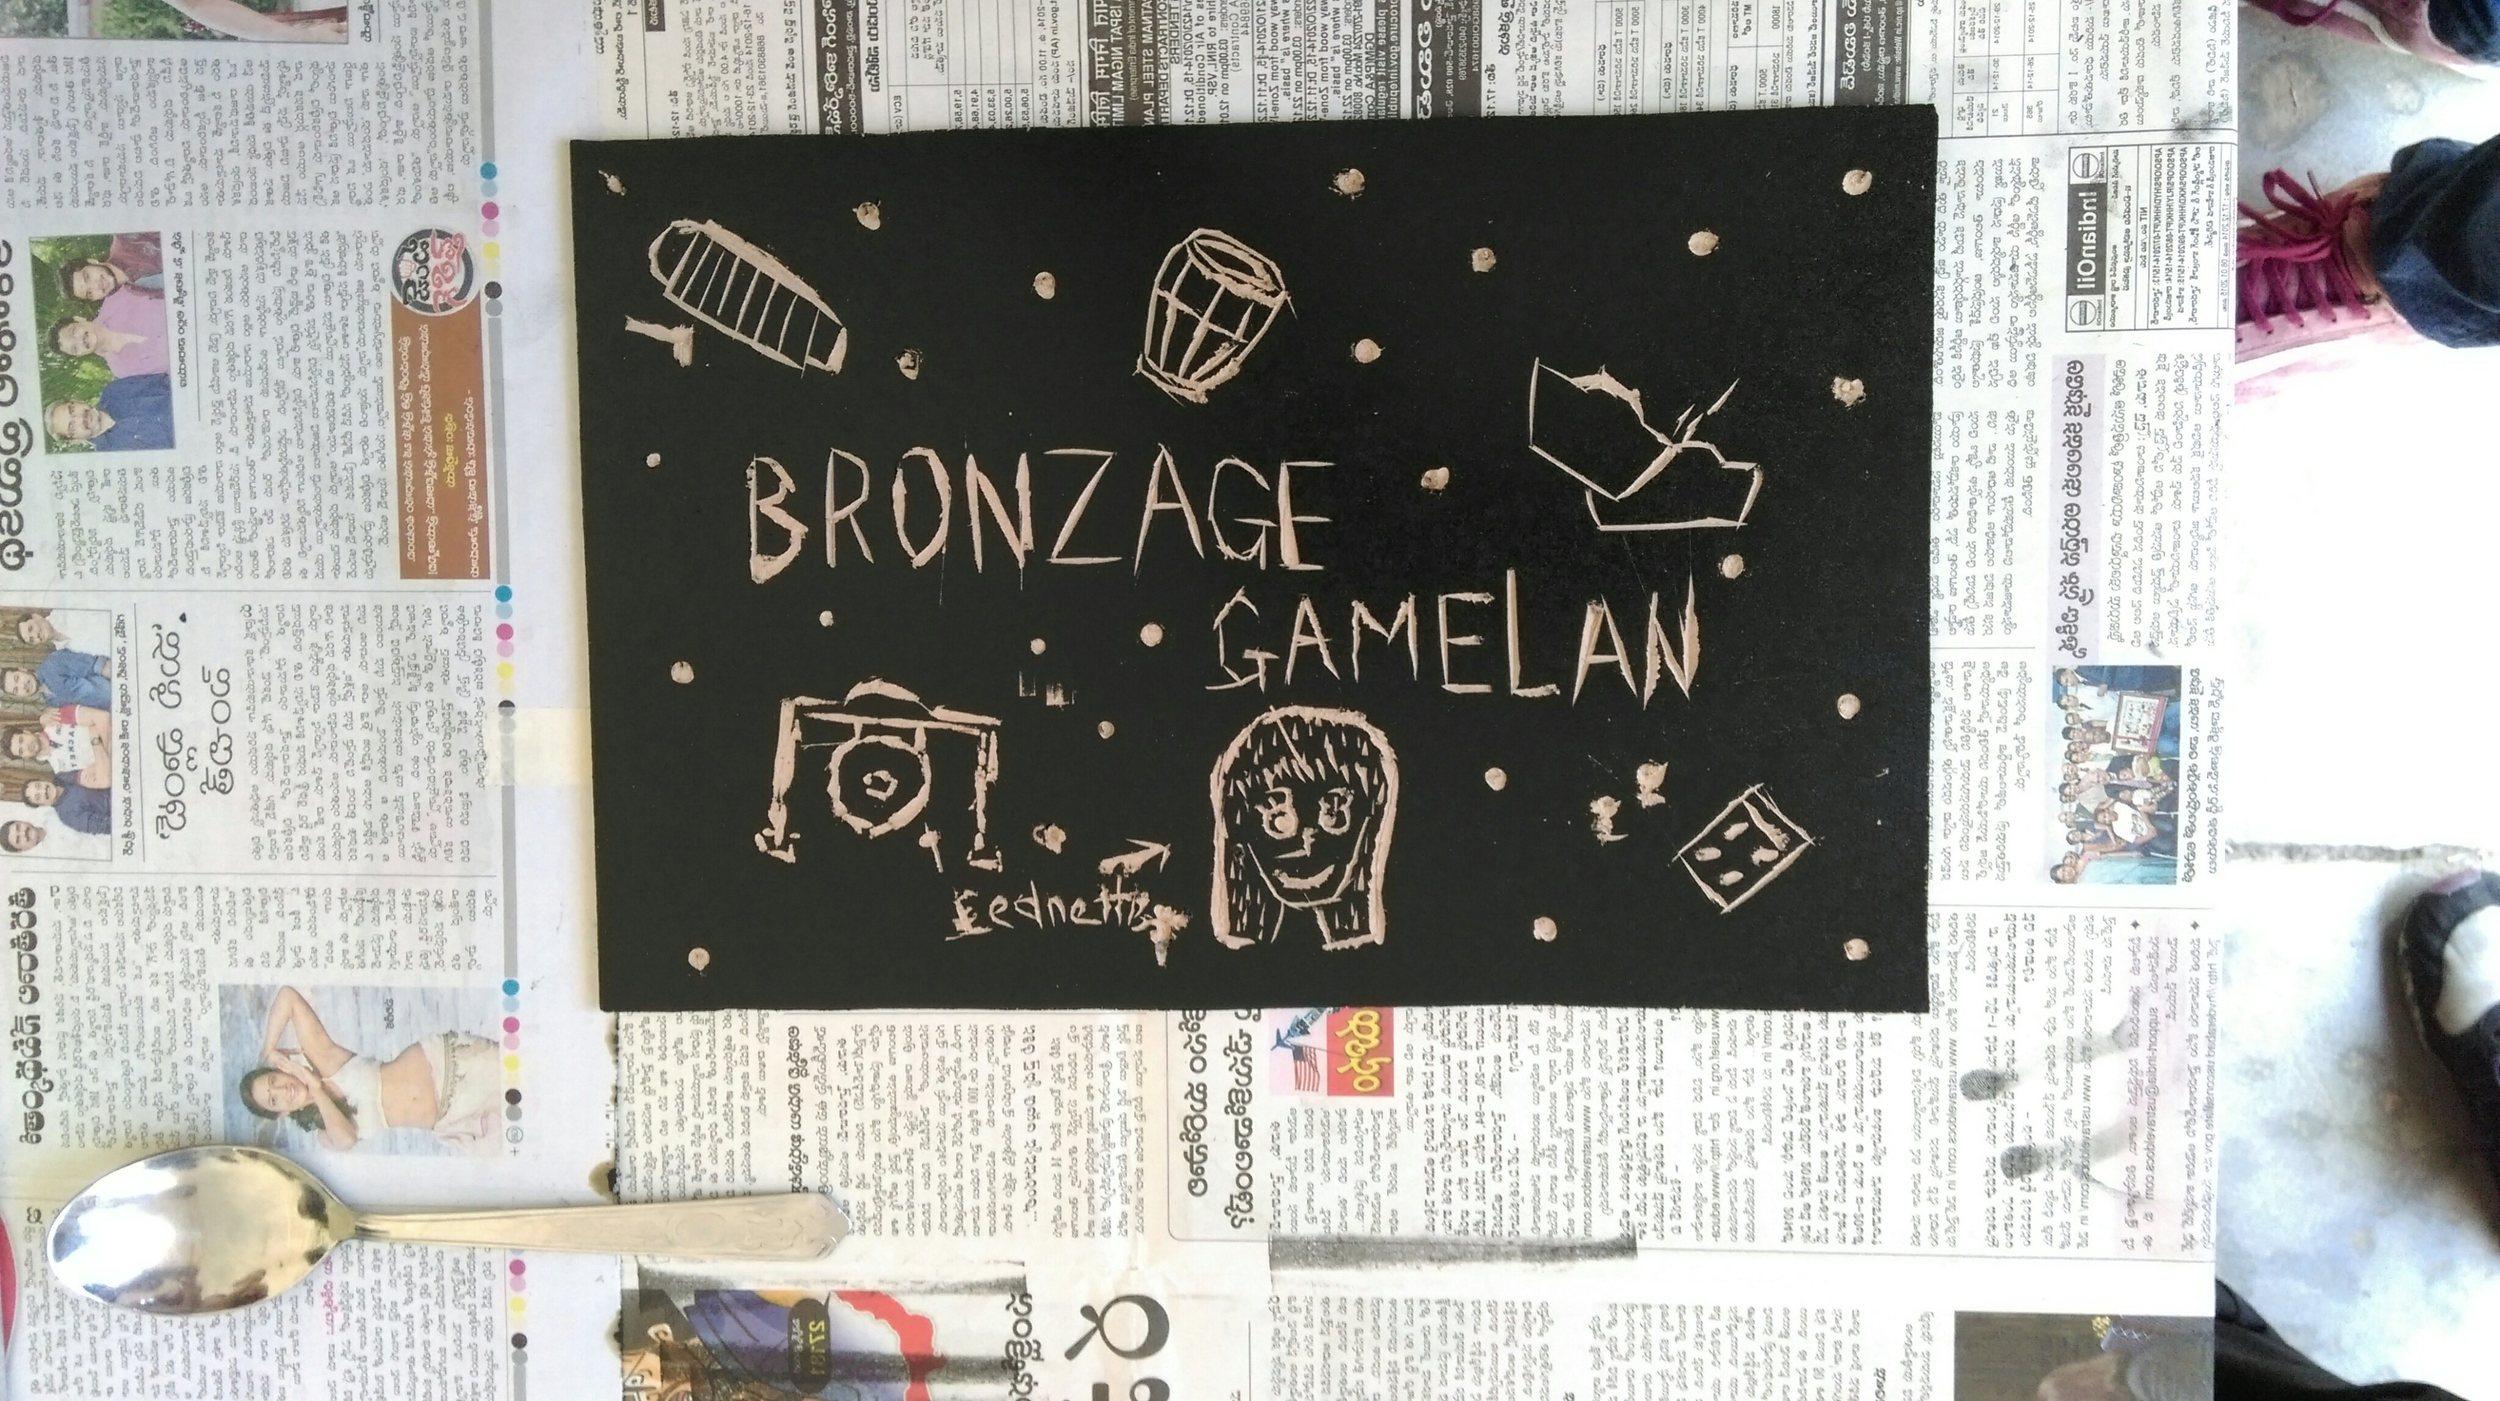 Our artwork!